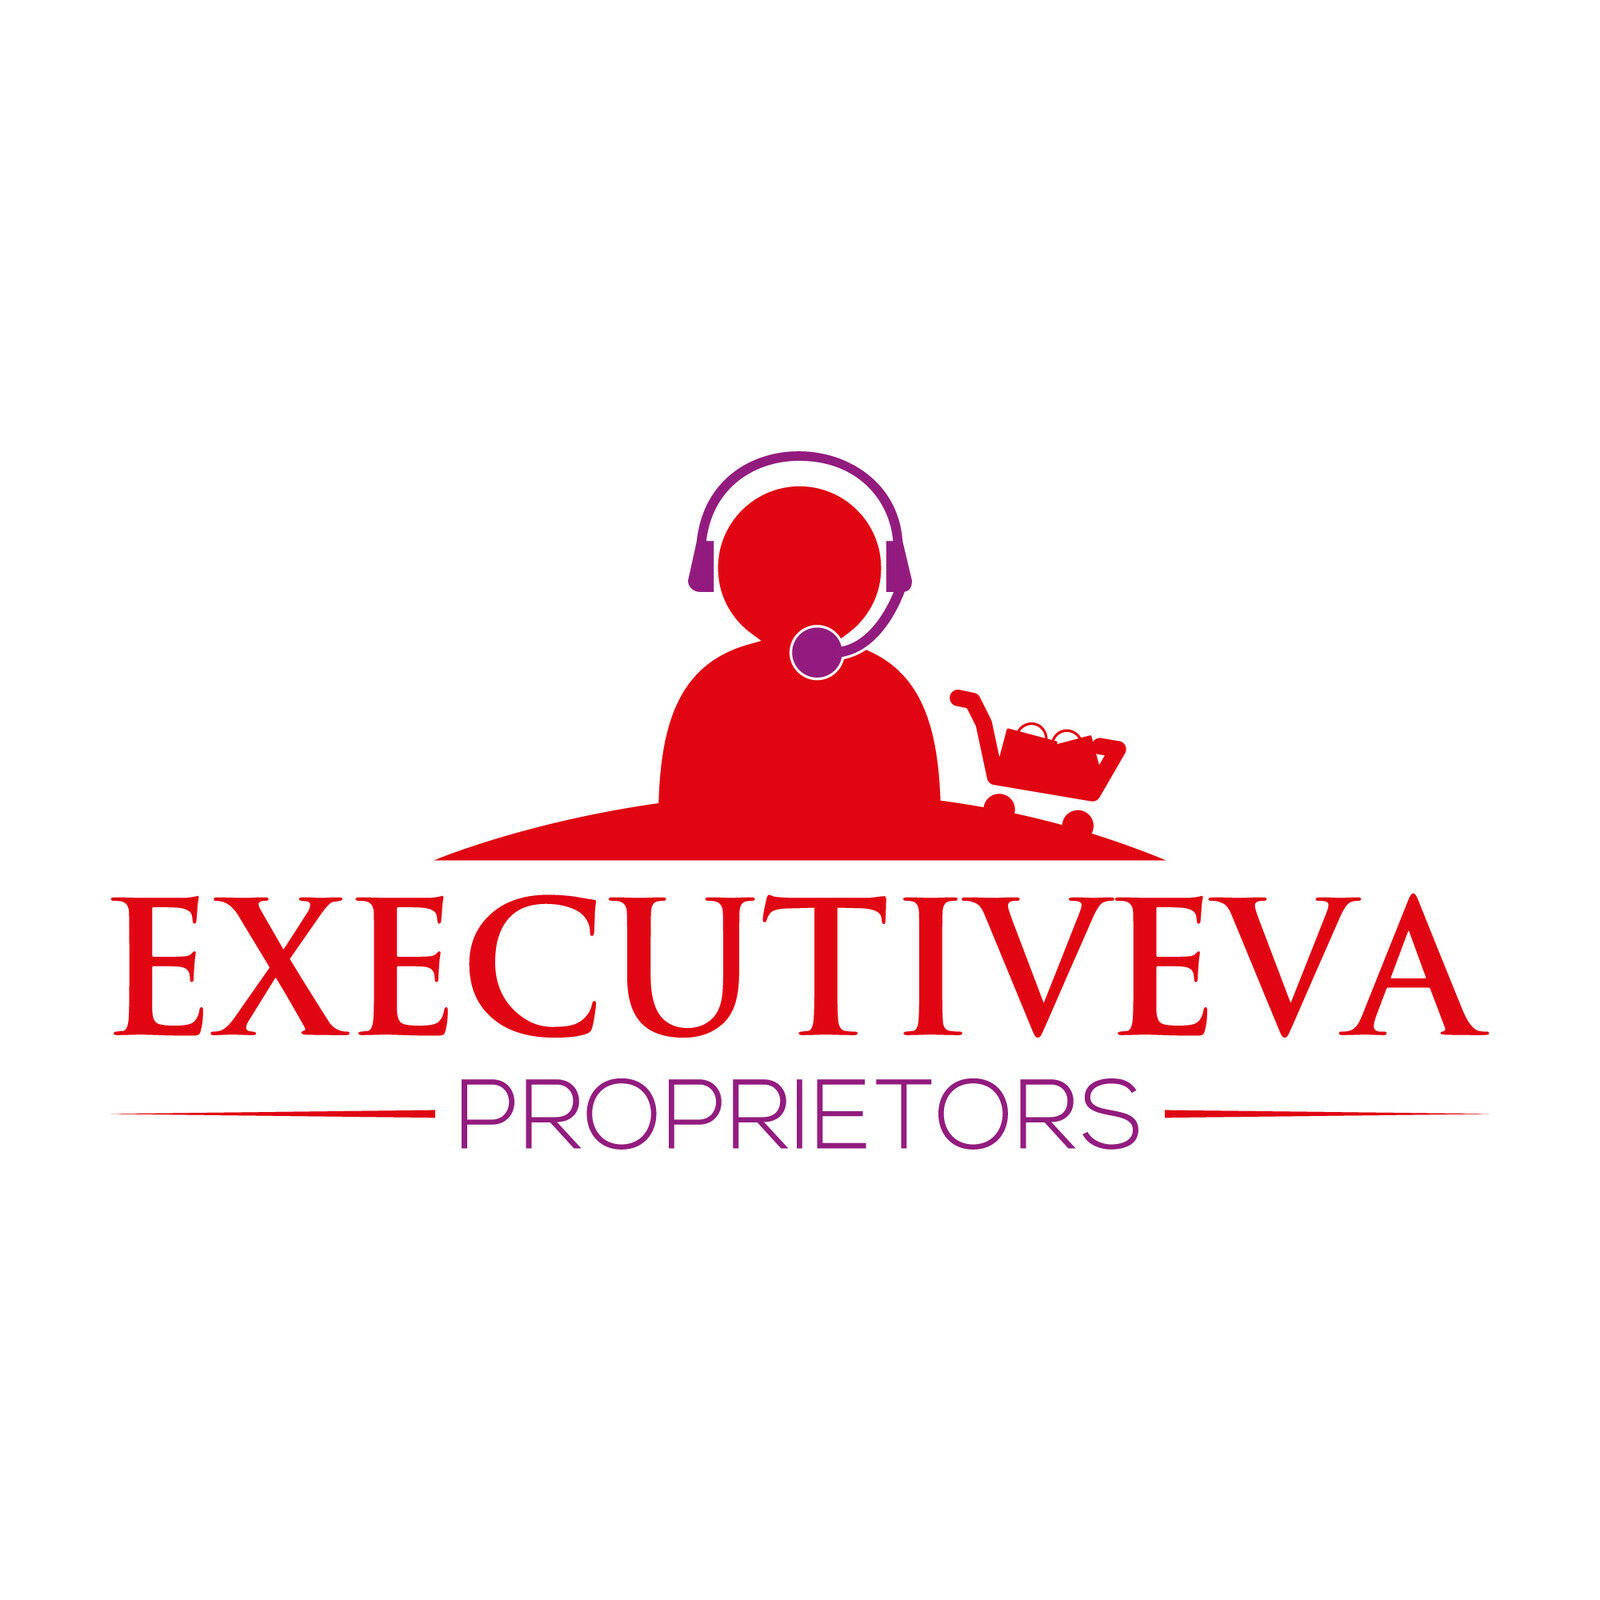 ExecutiveVA Proprietors